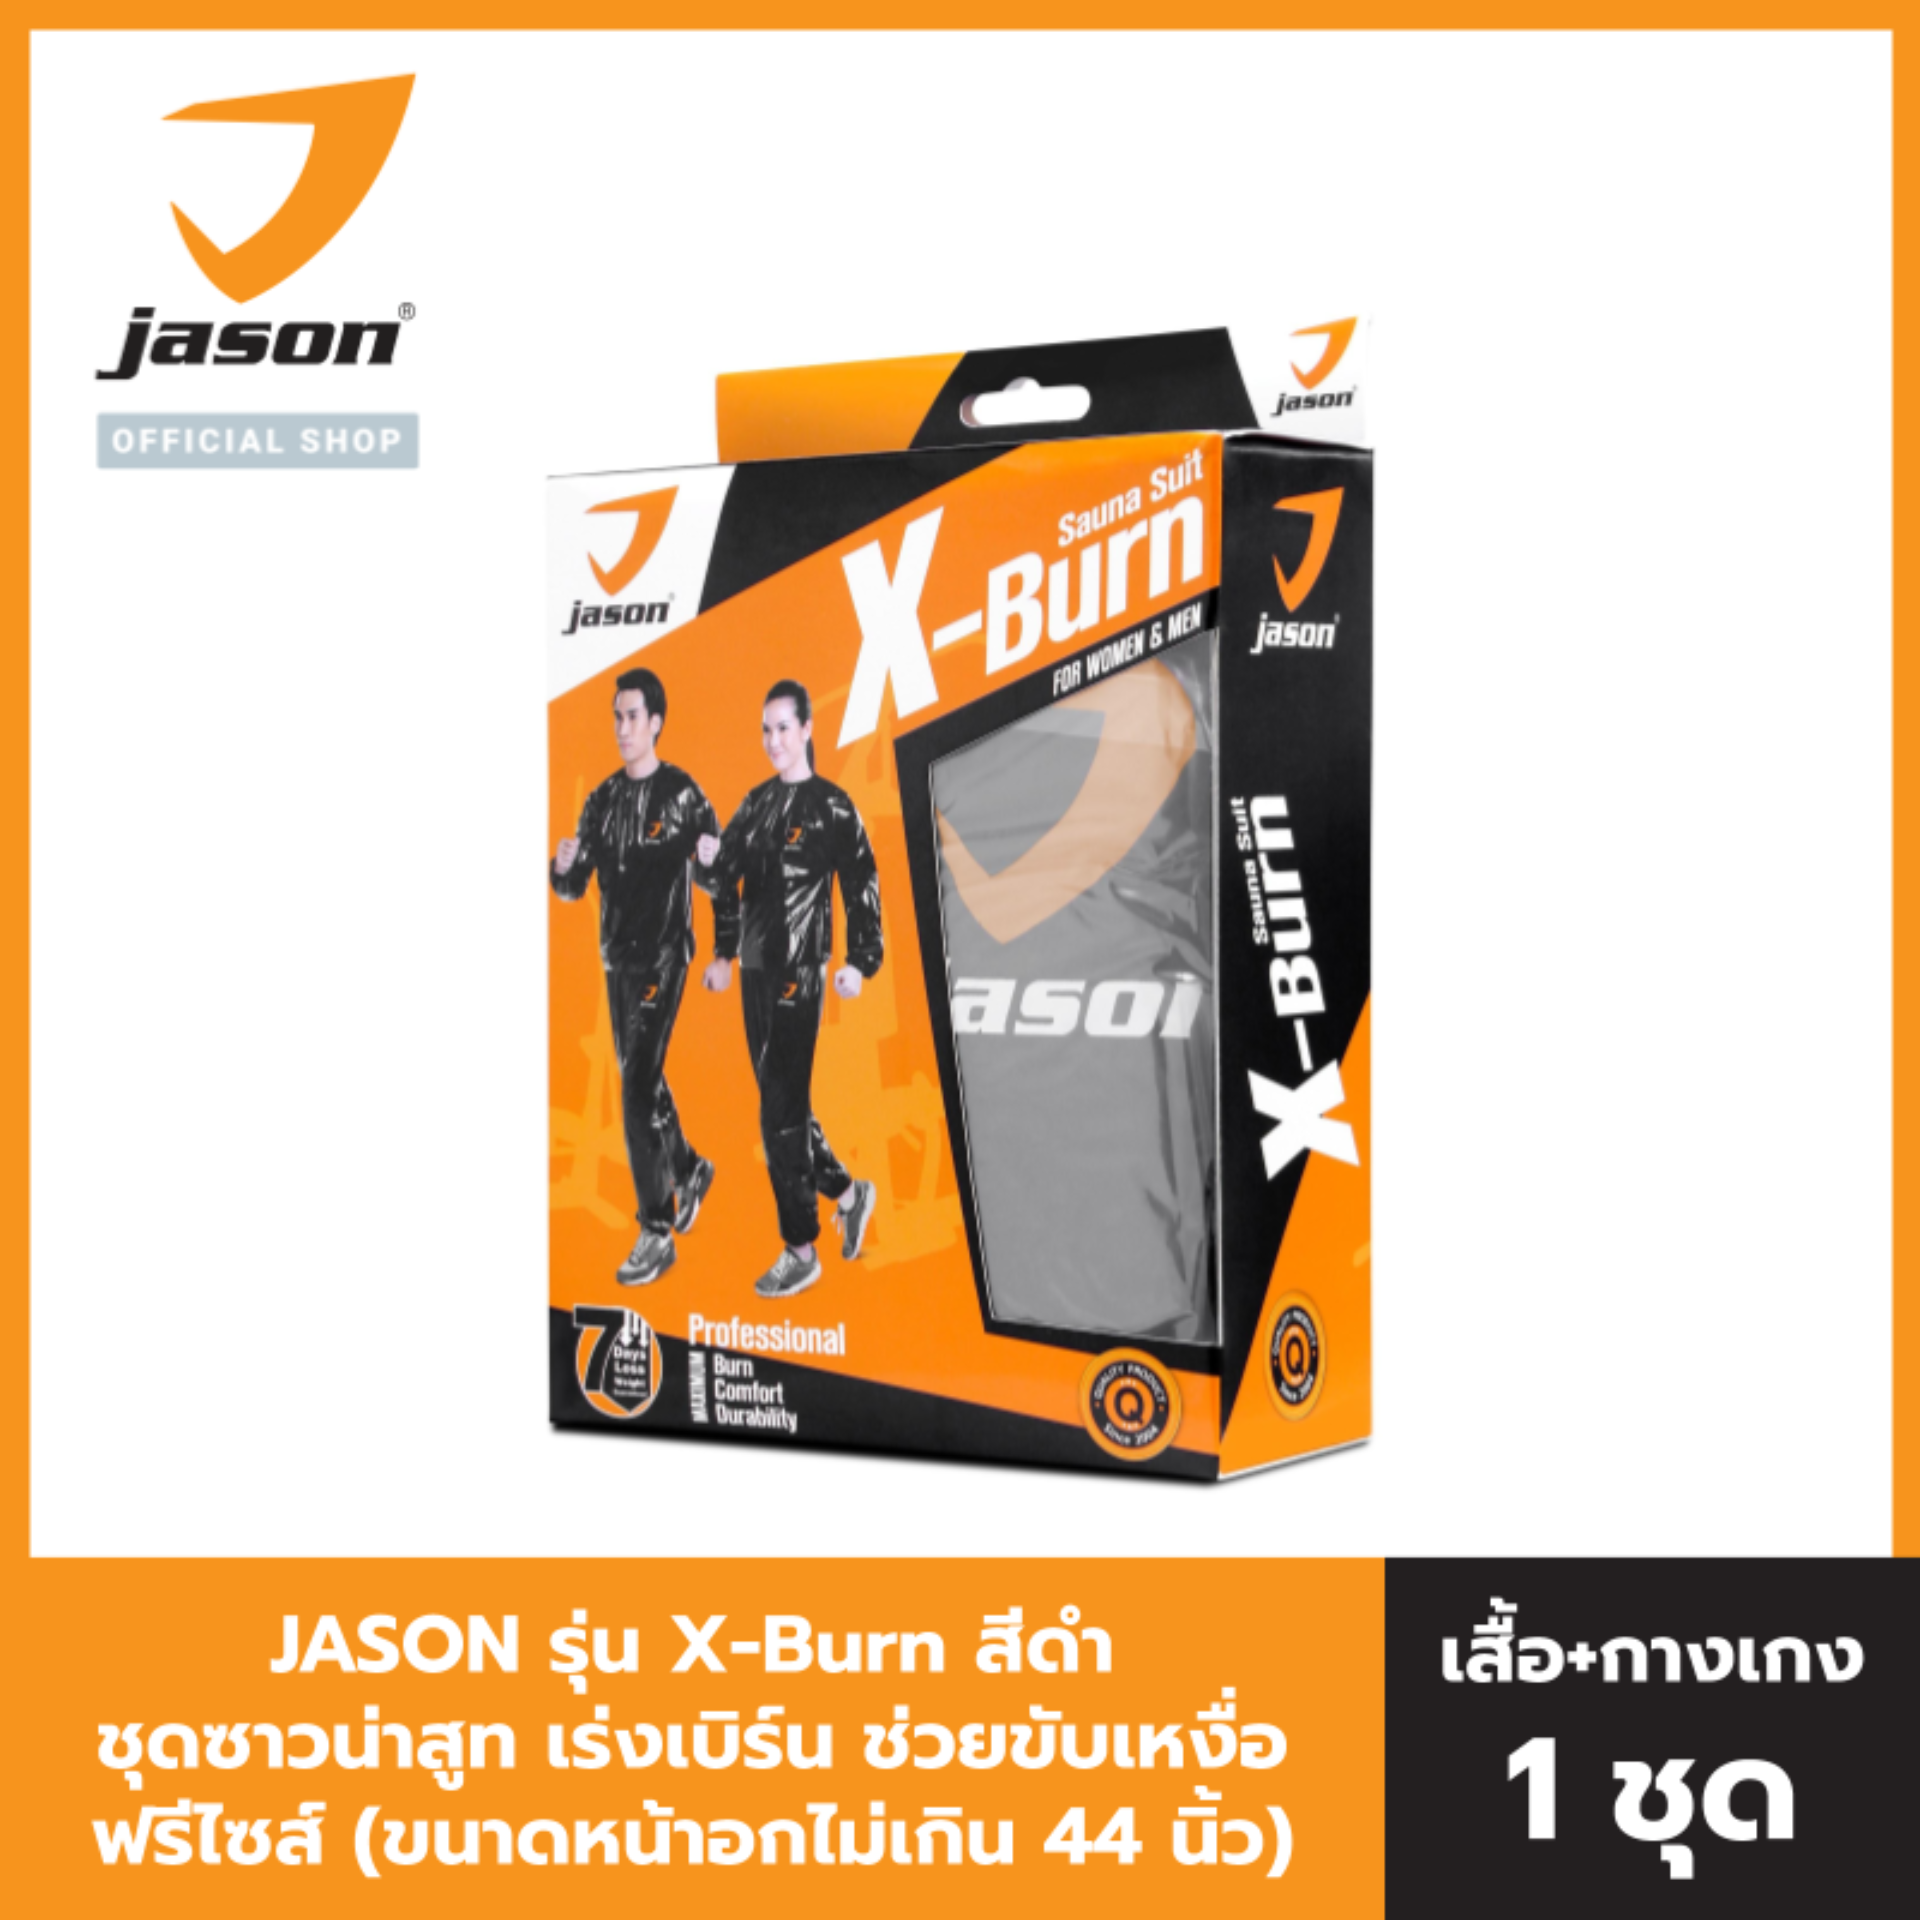 Jason เจสัน ชุดซาวน่าสูท รุ่น X-Burn Js0399 (ฟรีไซส์).